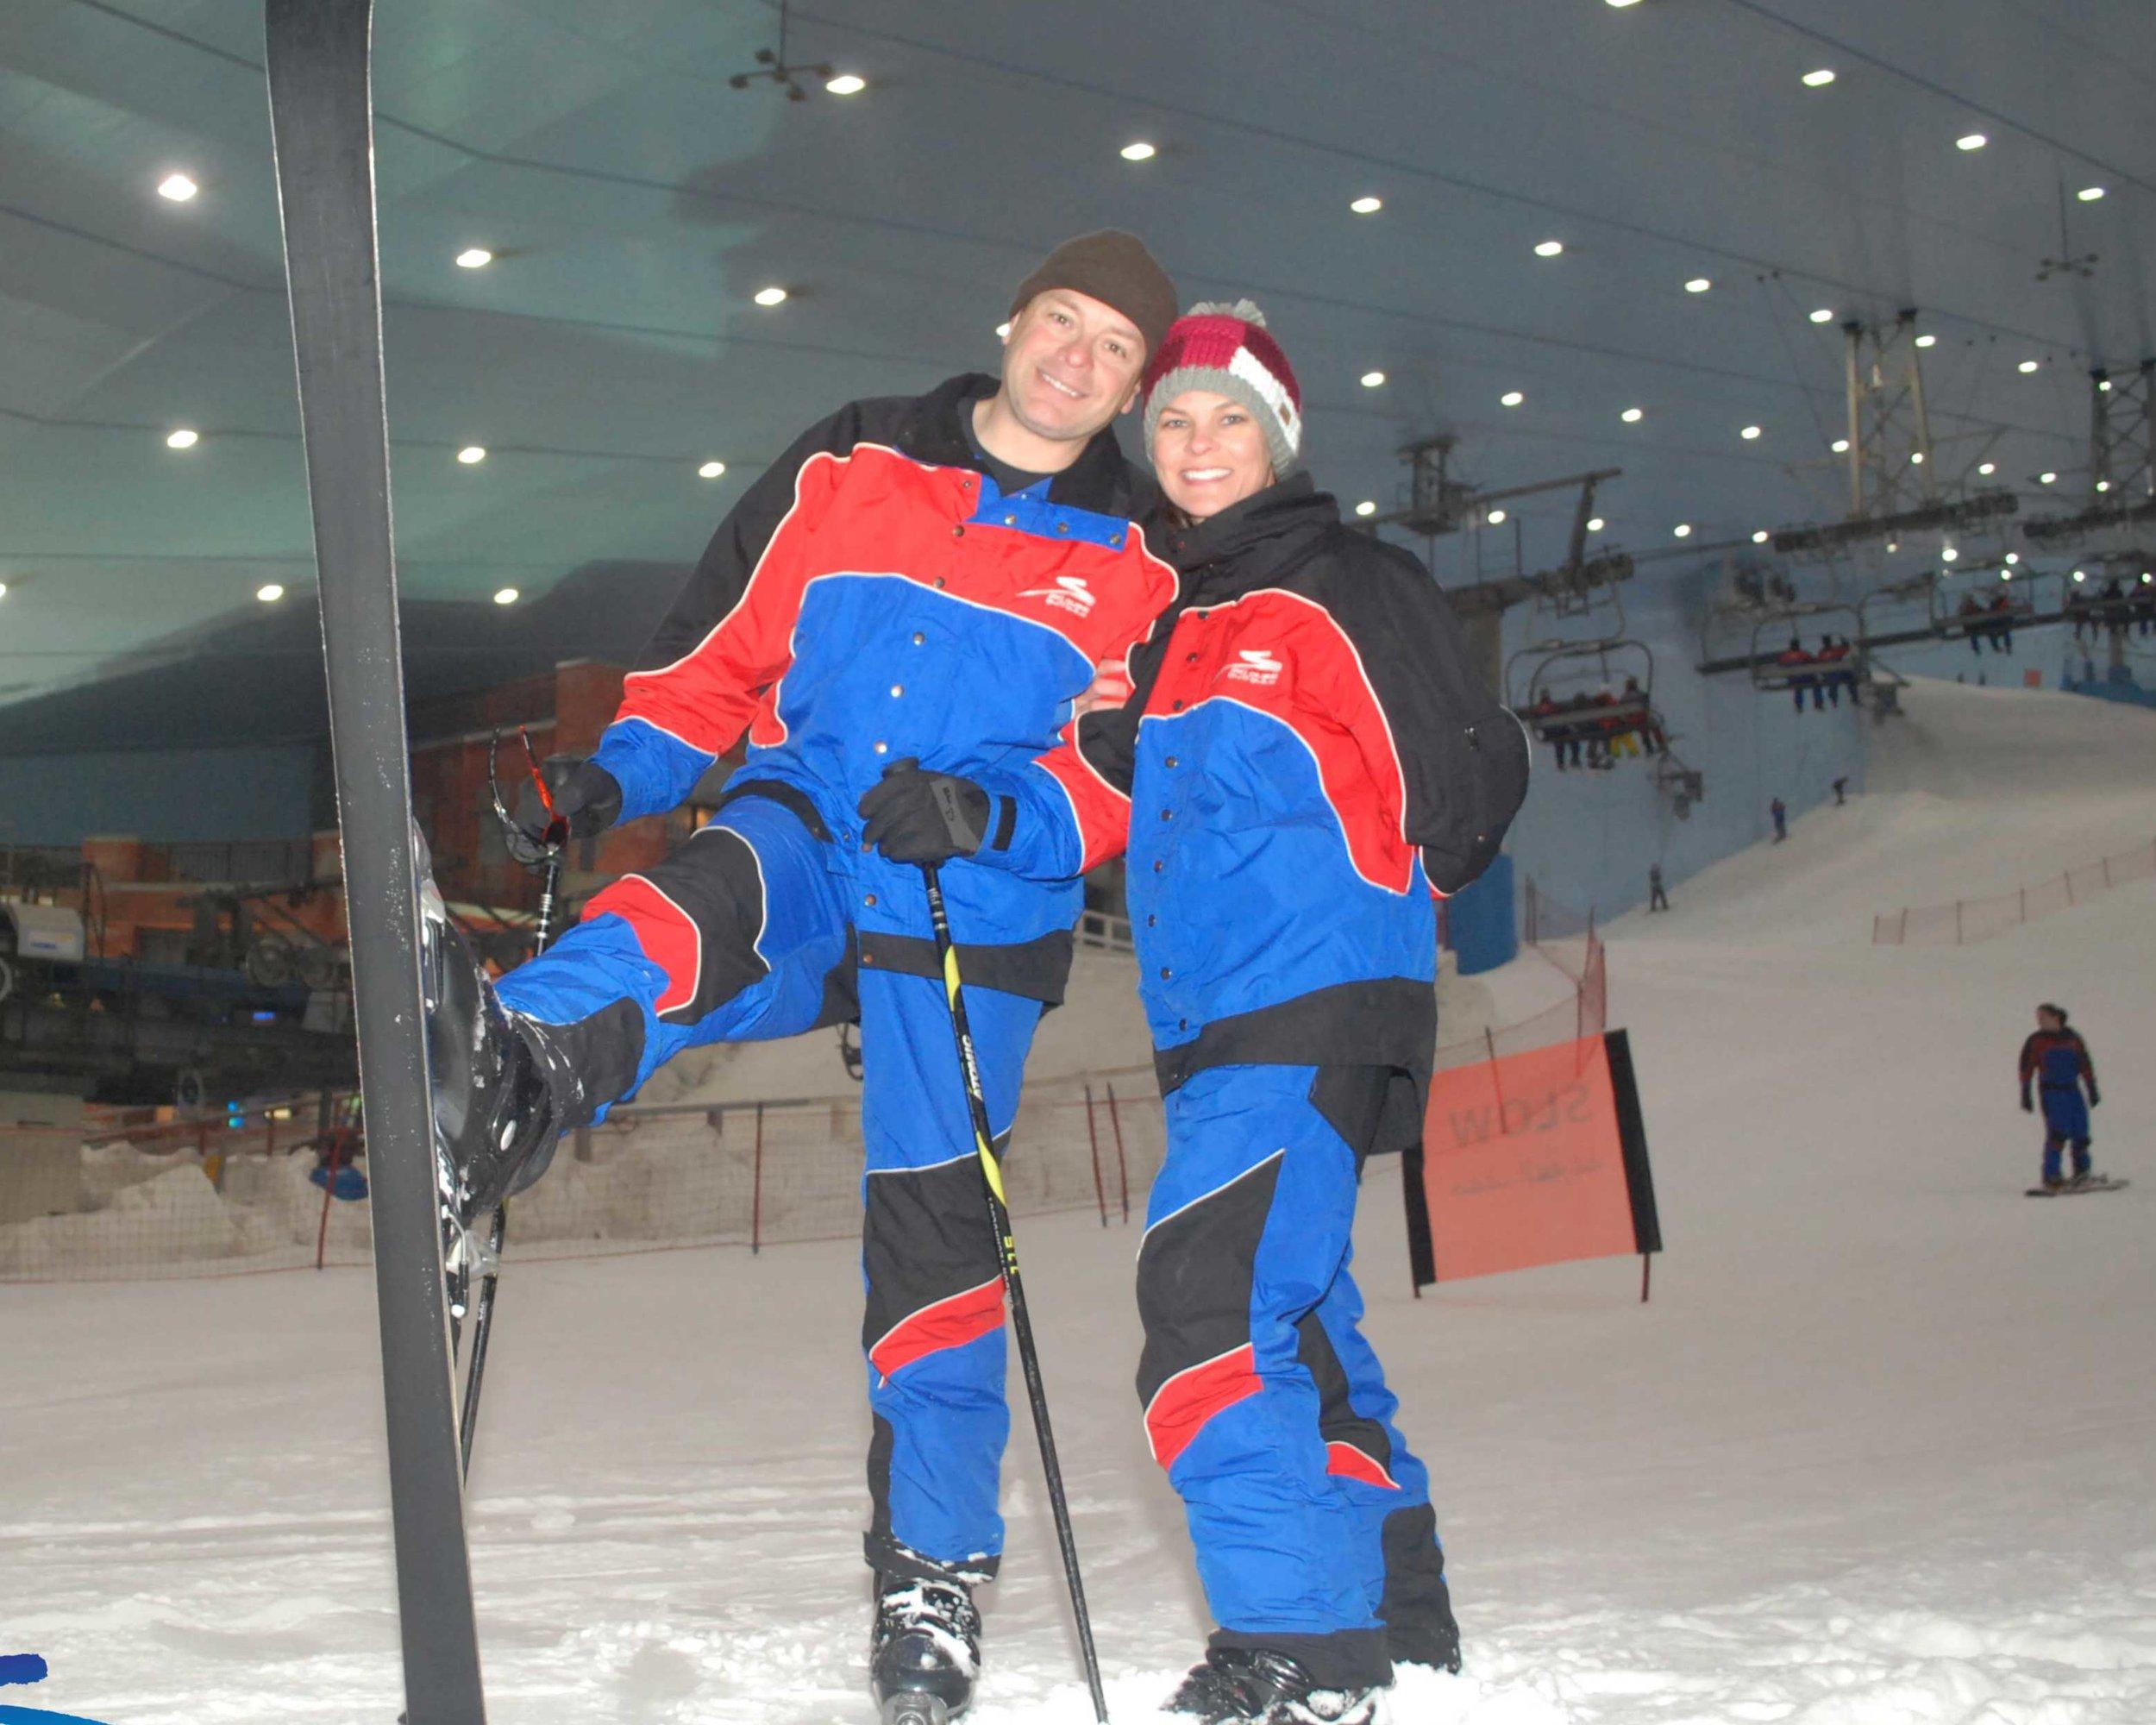 Fay and Sean skiing while in Dubai